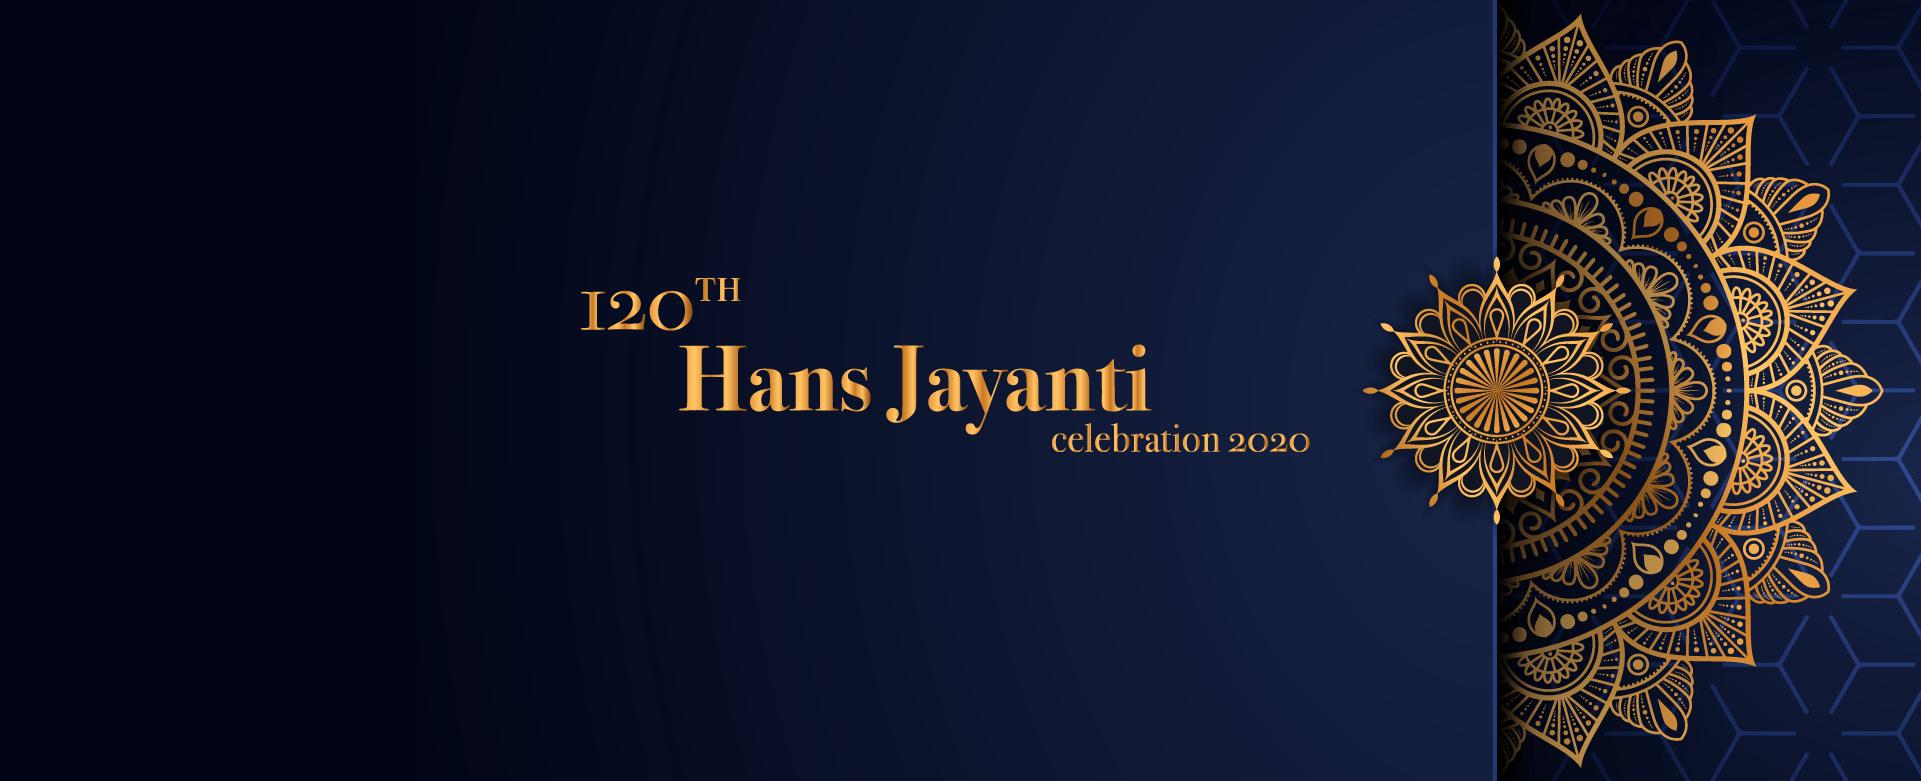 Hans Jayanti 120th Celebration (Video)